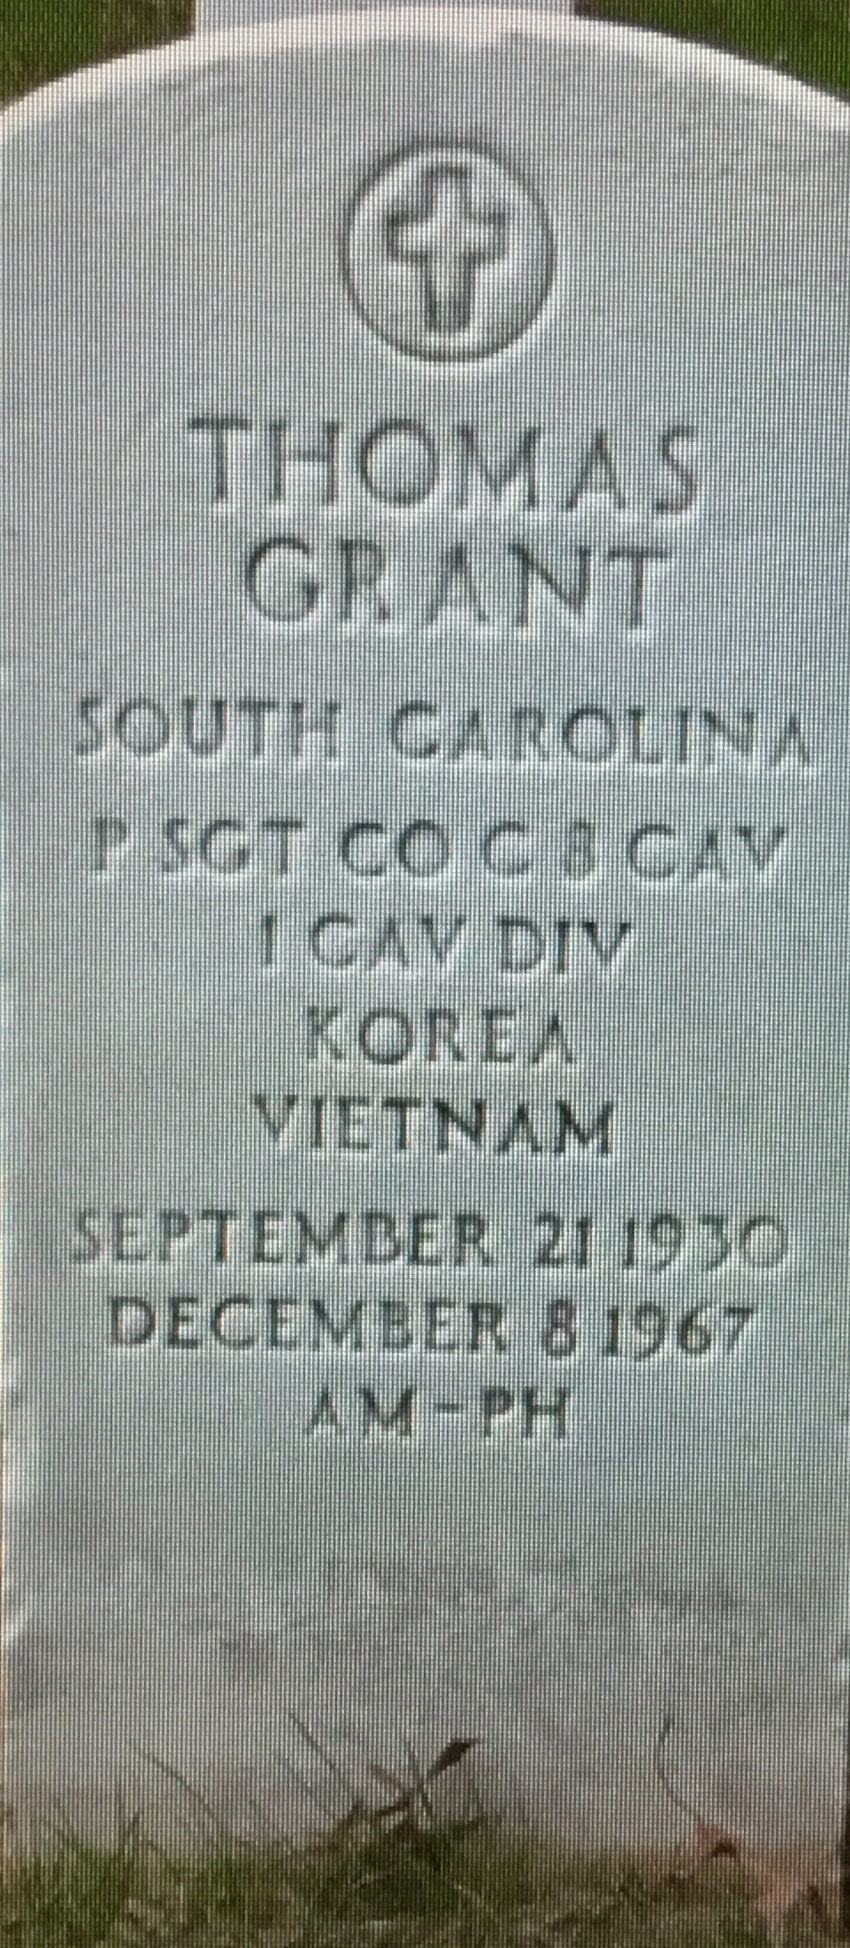 Sgt. Thomas Grant